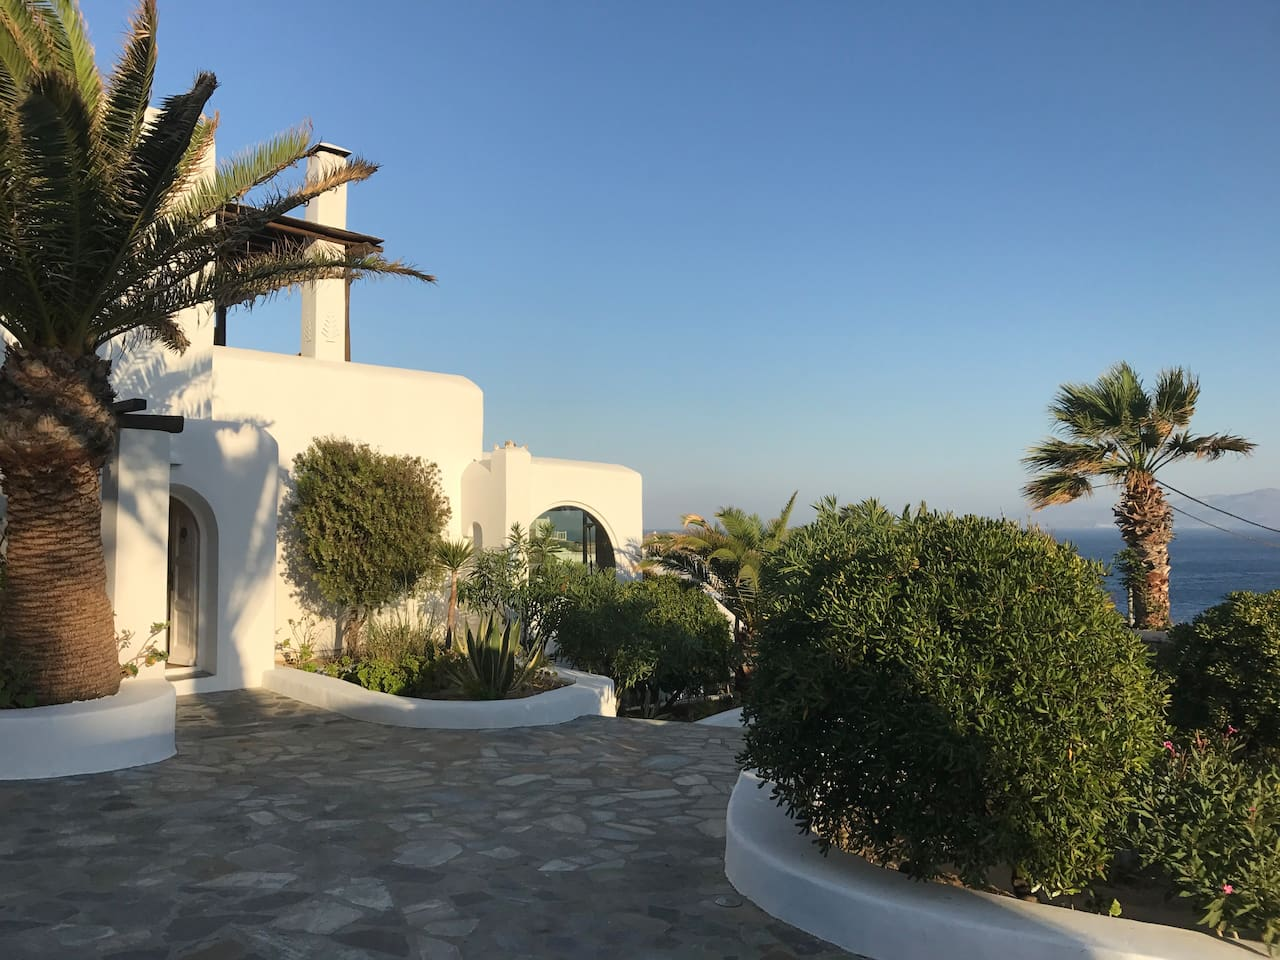 Apartment Luxurious gorgeous villa with 5 star hospitality photo 23650405